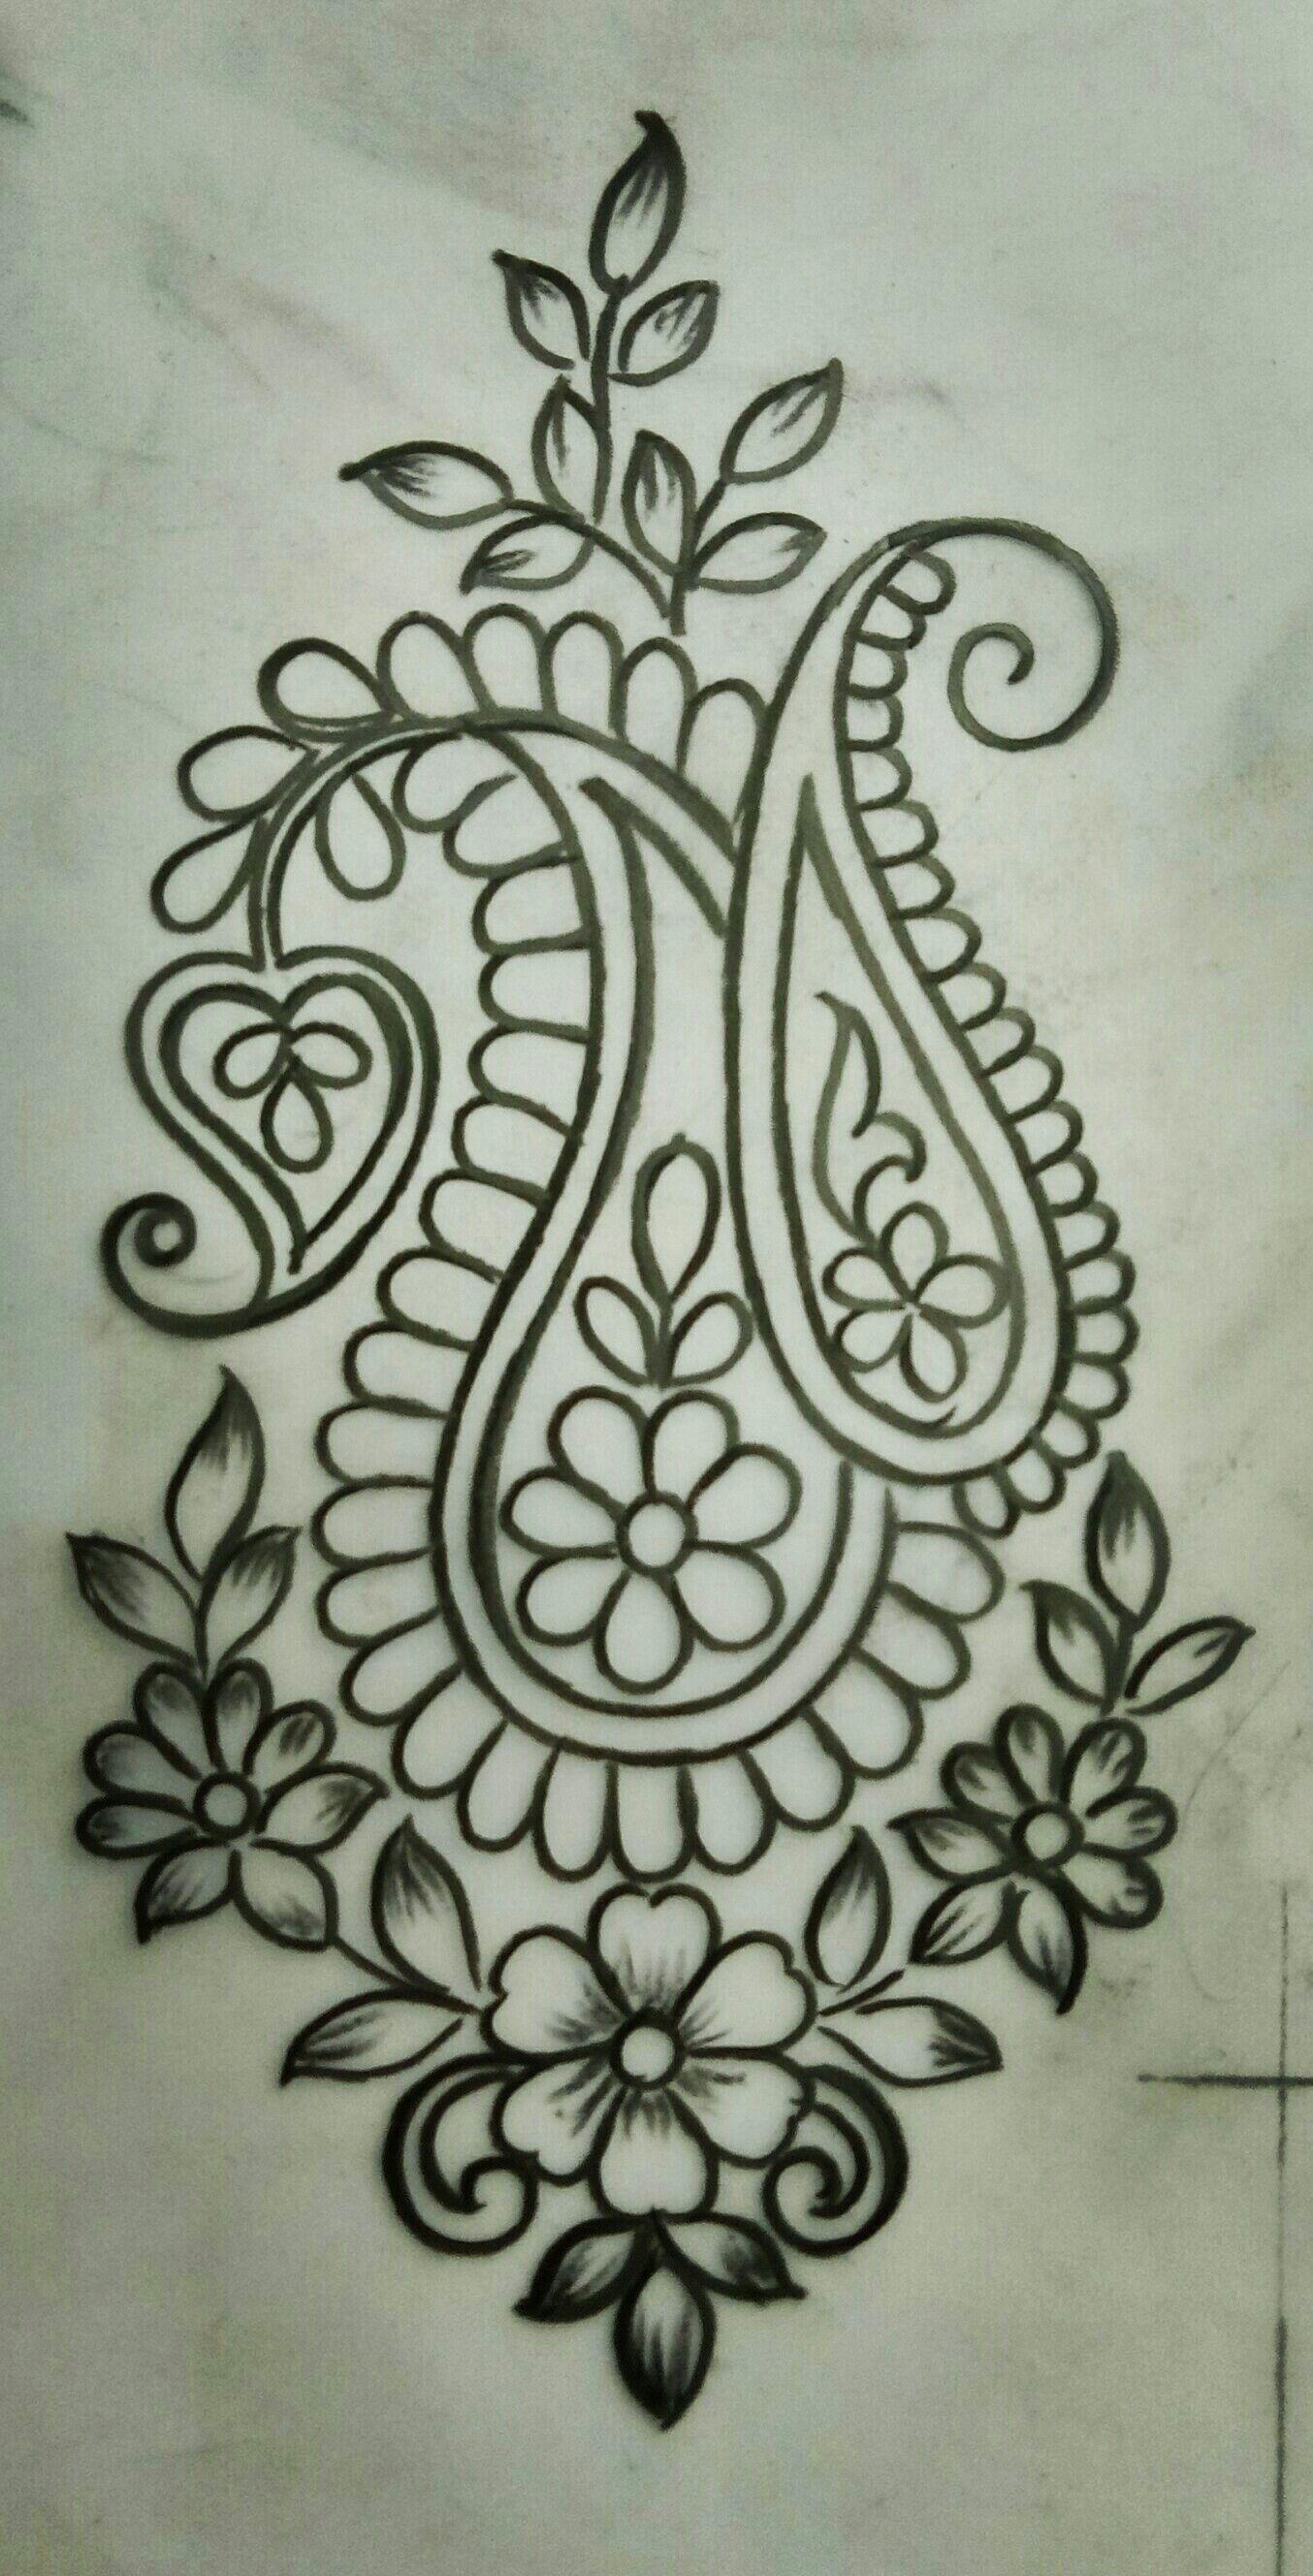 Pin by eudy serrano on estilizados pinterest embroidery hand